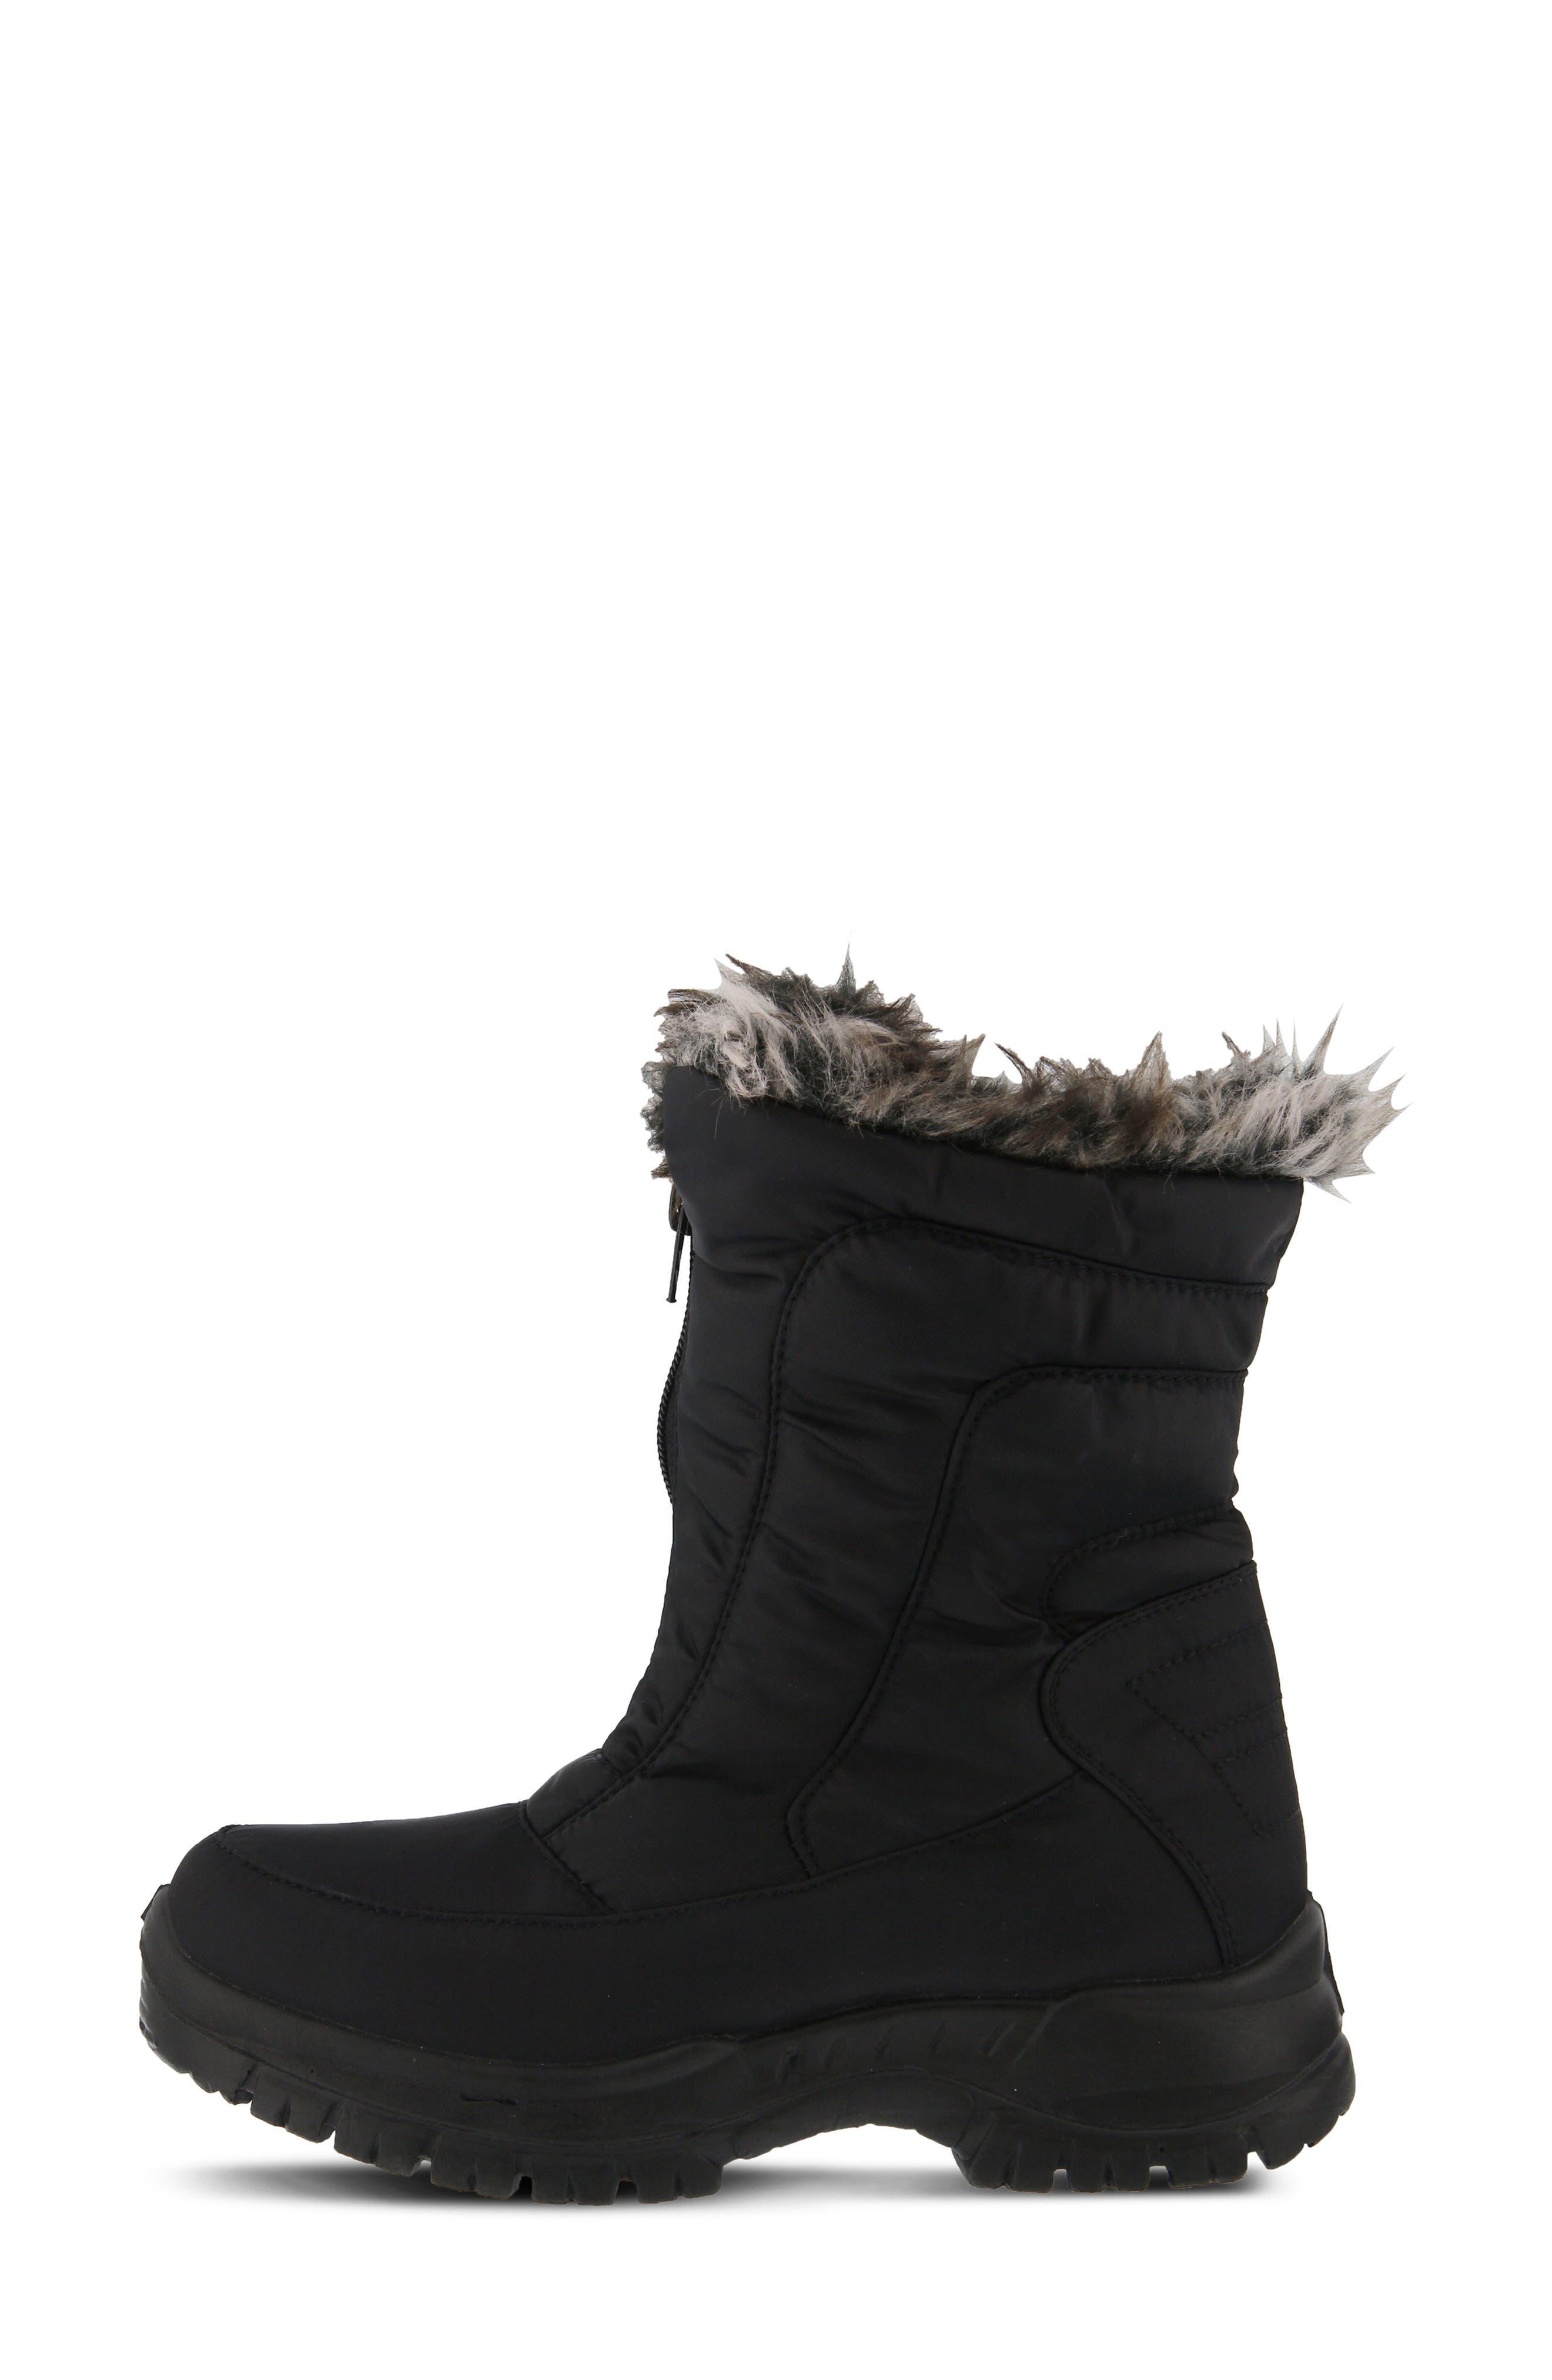 SPRING STEP,                             Zigzag Waterproof Faux Fur Bootie,                             Alternate thumbnail 6, color,                             BLACK FABRIC